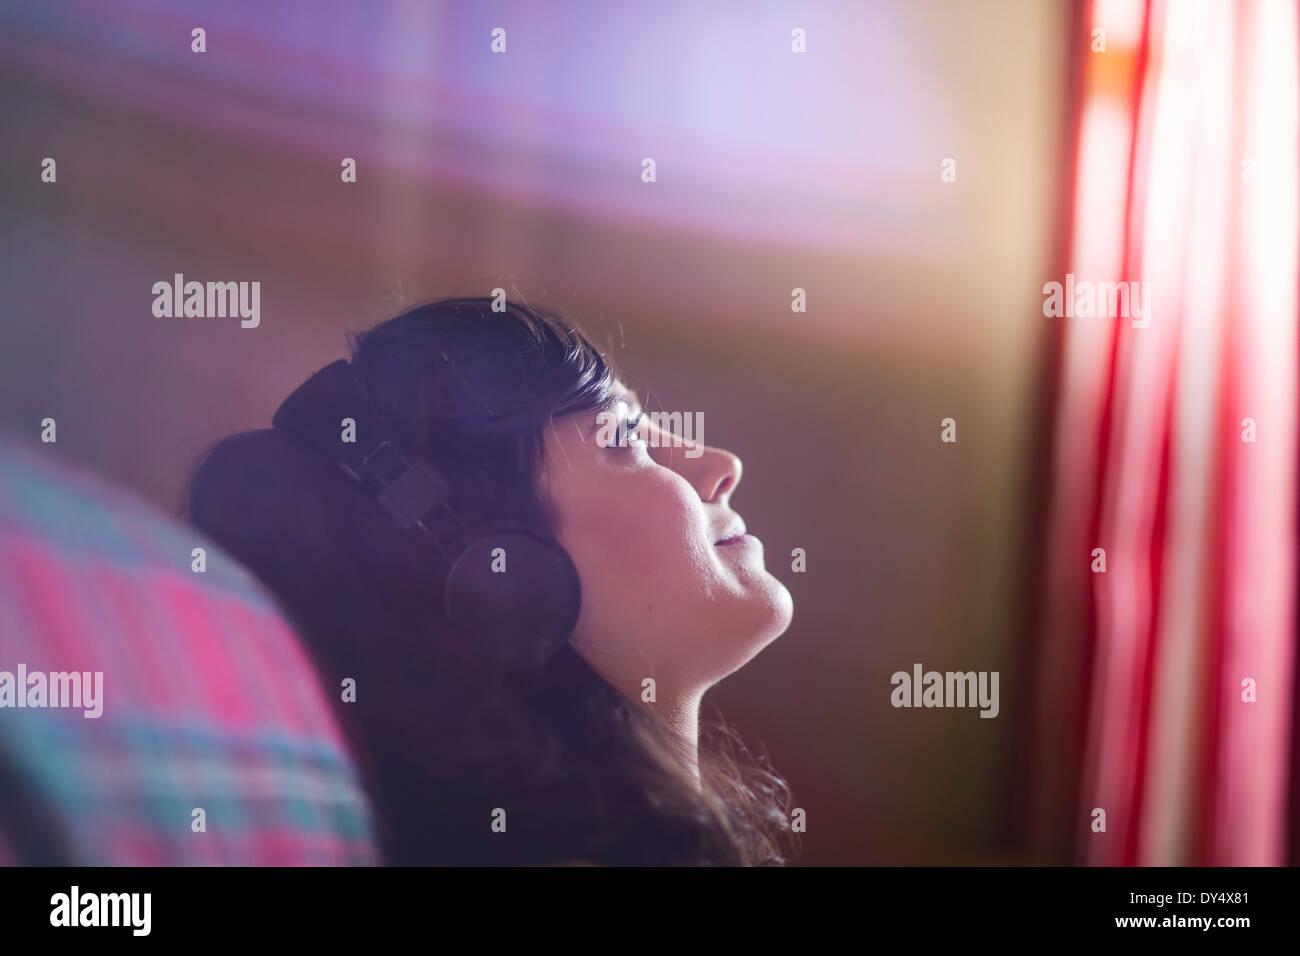 Mujer joven usando audífonos, soñar despierto Imagen De Stock